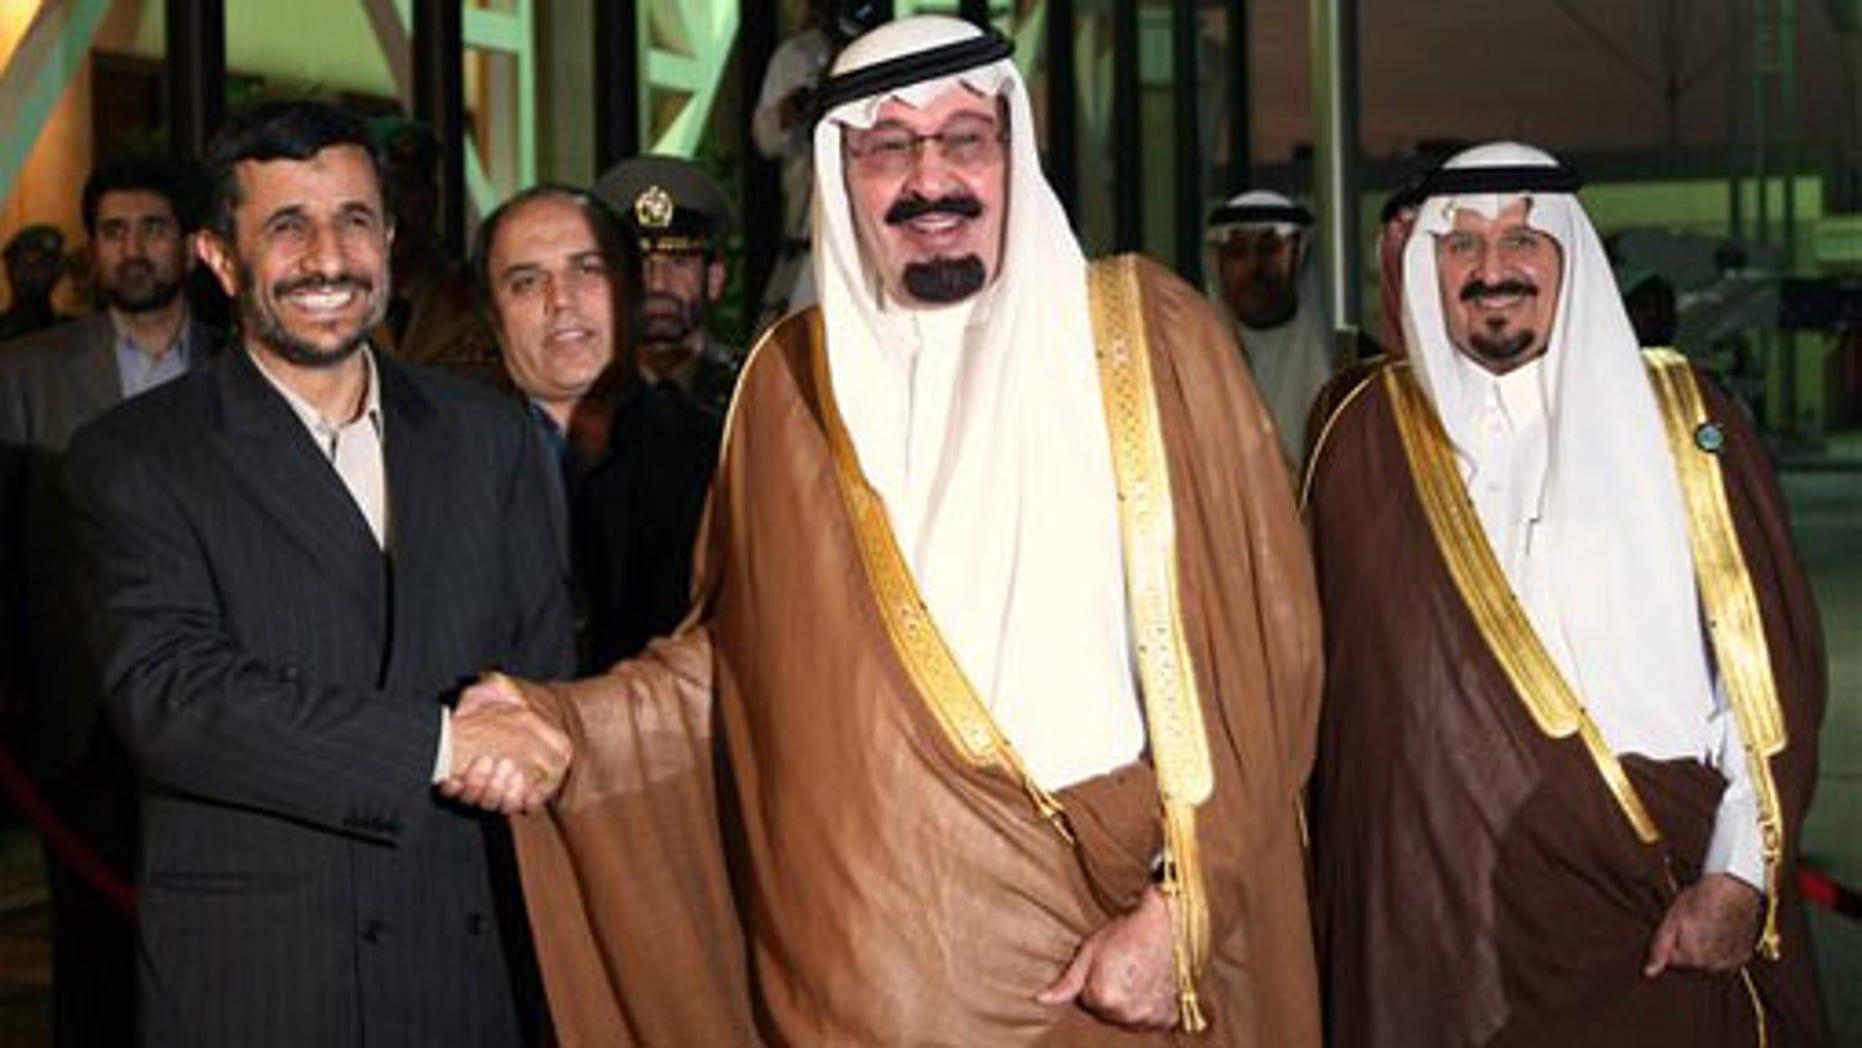 Nov. 2007: Saudi Arabia's King Abdullah, middle, shakes hands with Iran's President Mahmoud Ahmadinejad, left, as Crown Prince Sultan looks on at Riyadh airport.